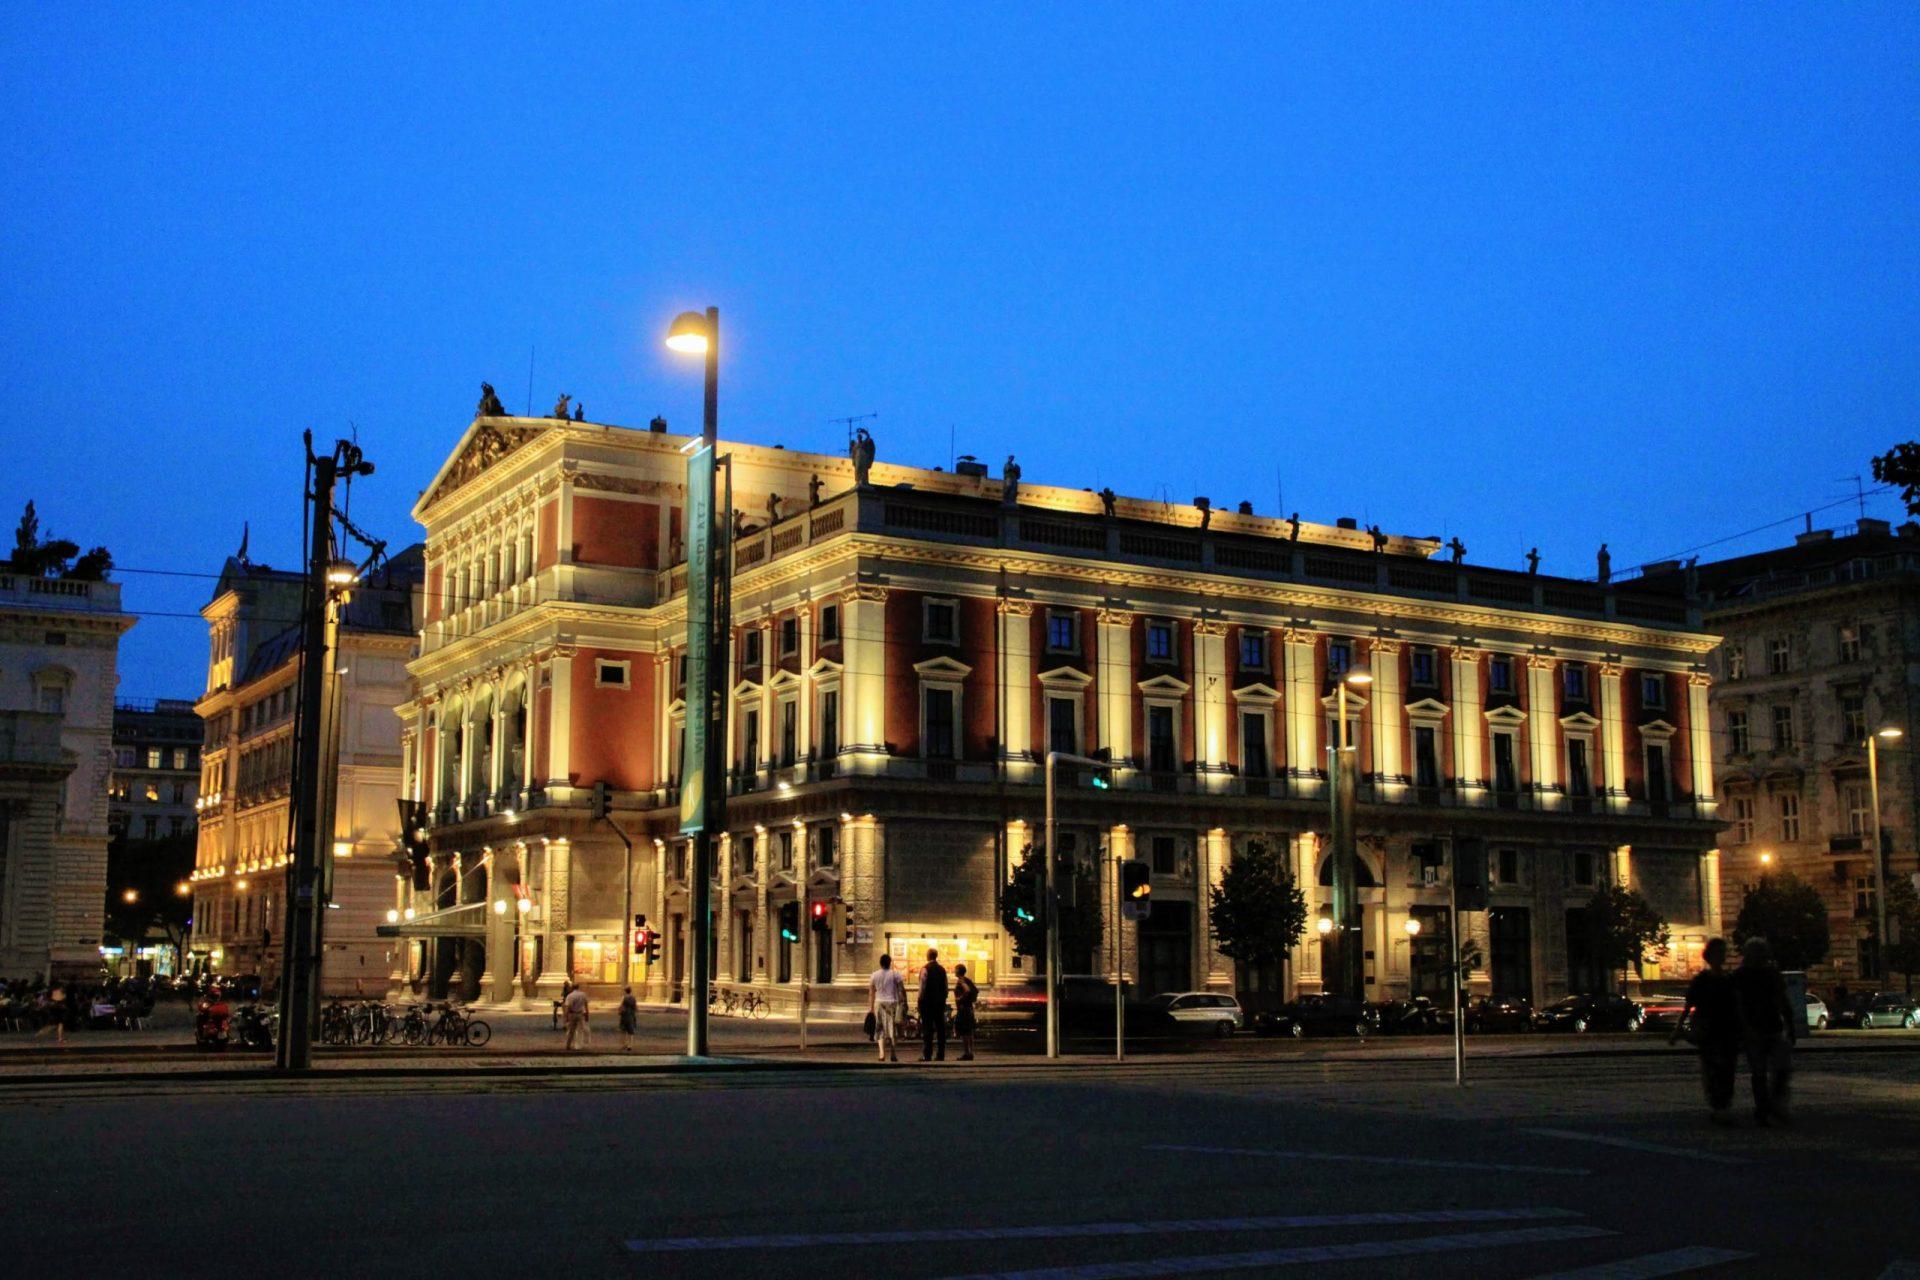 Музикферайн, Вена, Австрия. Июль, 2012